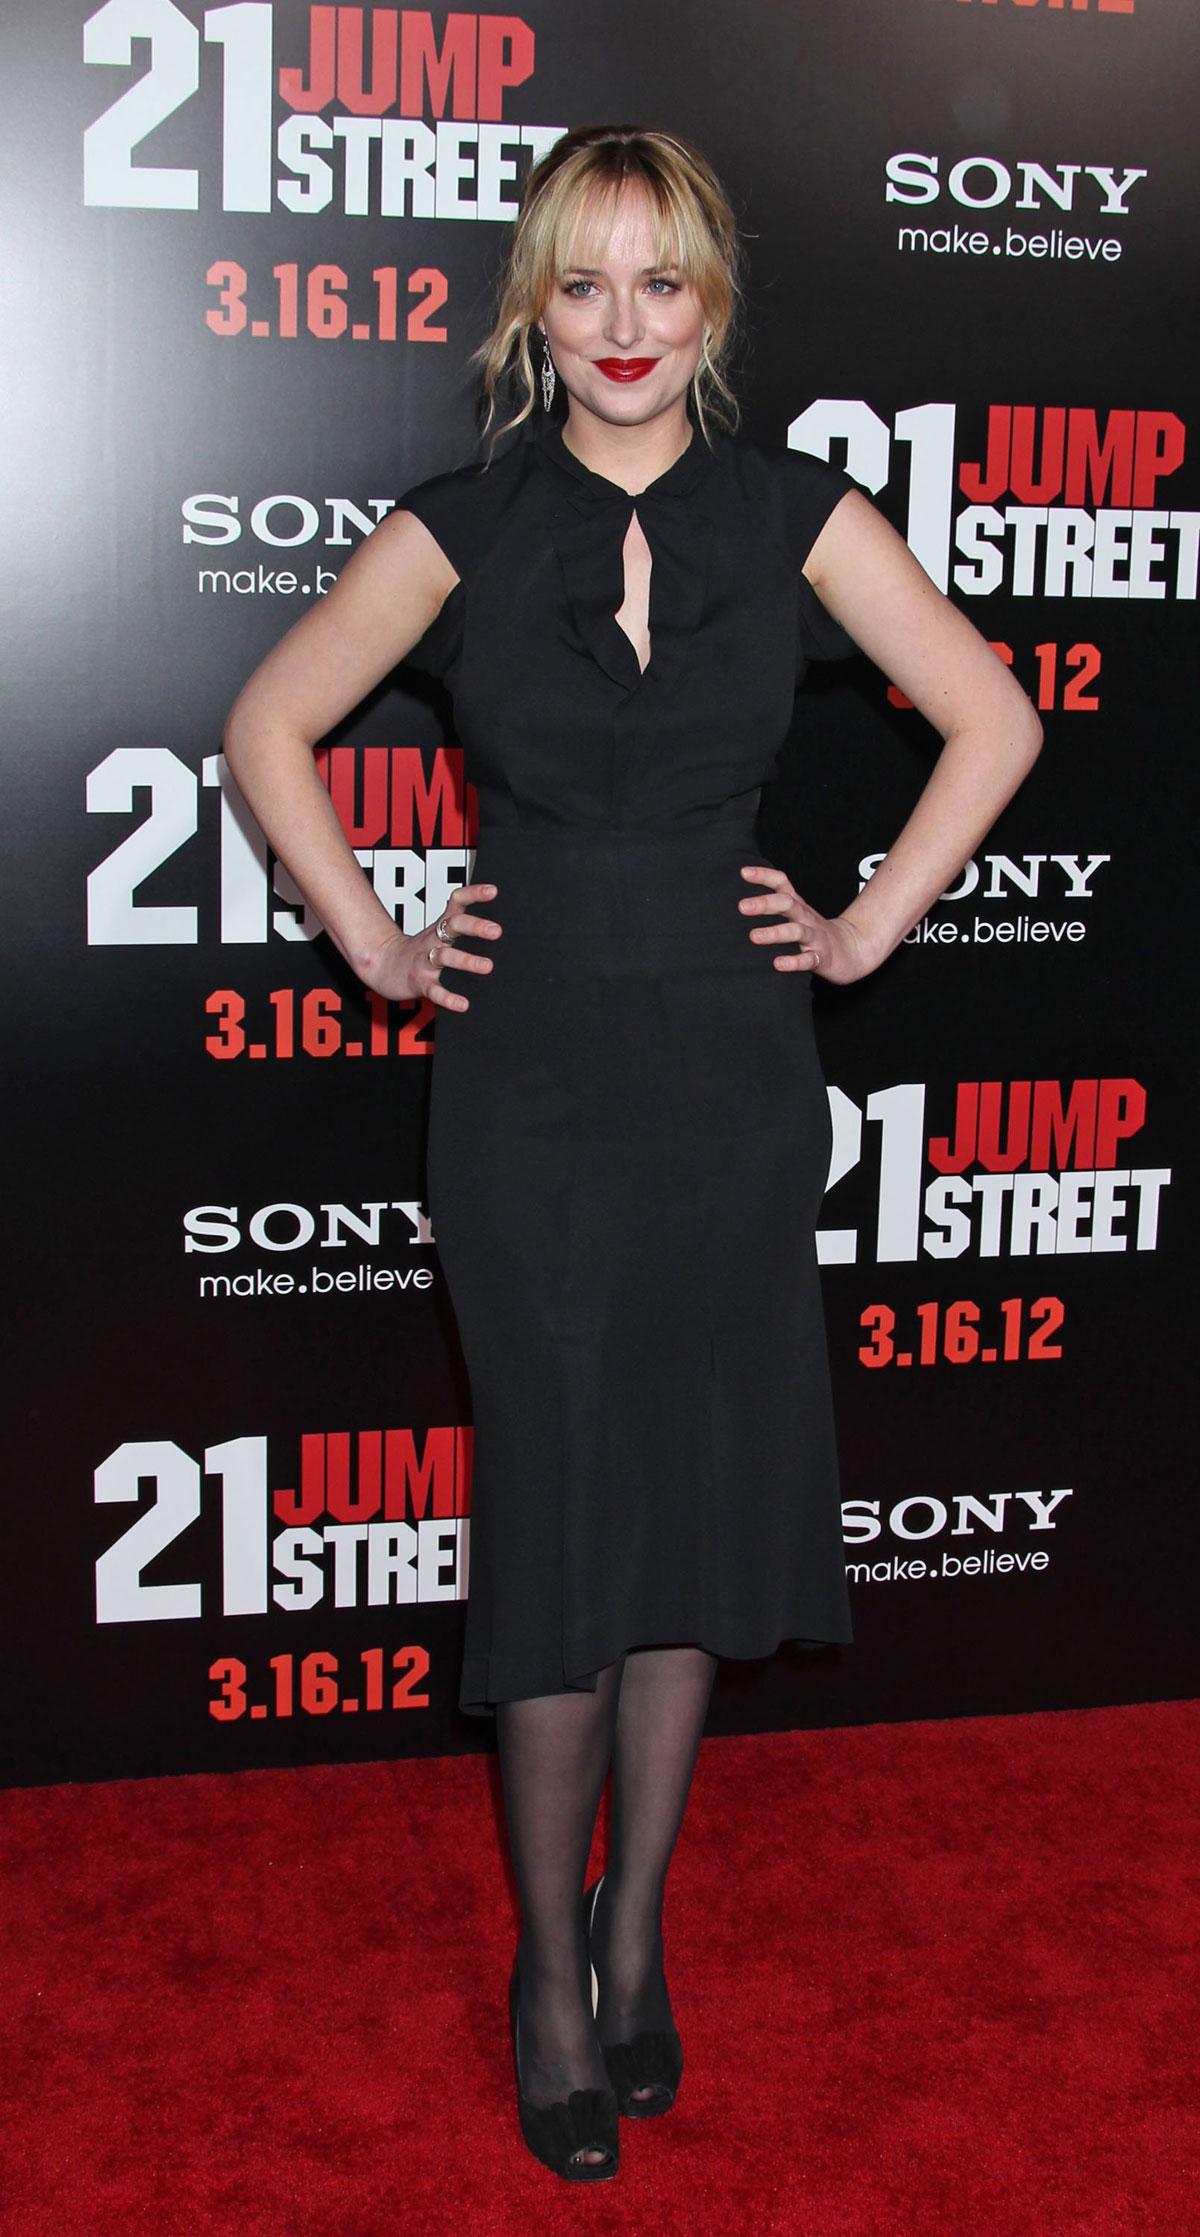 DAKOTA JOHNSON at 21 Jump Street Premiere in Los Angeles ... Jennifer Lopez On Facebook